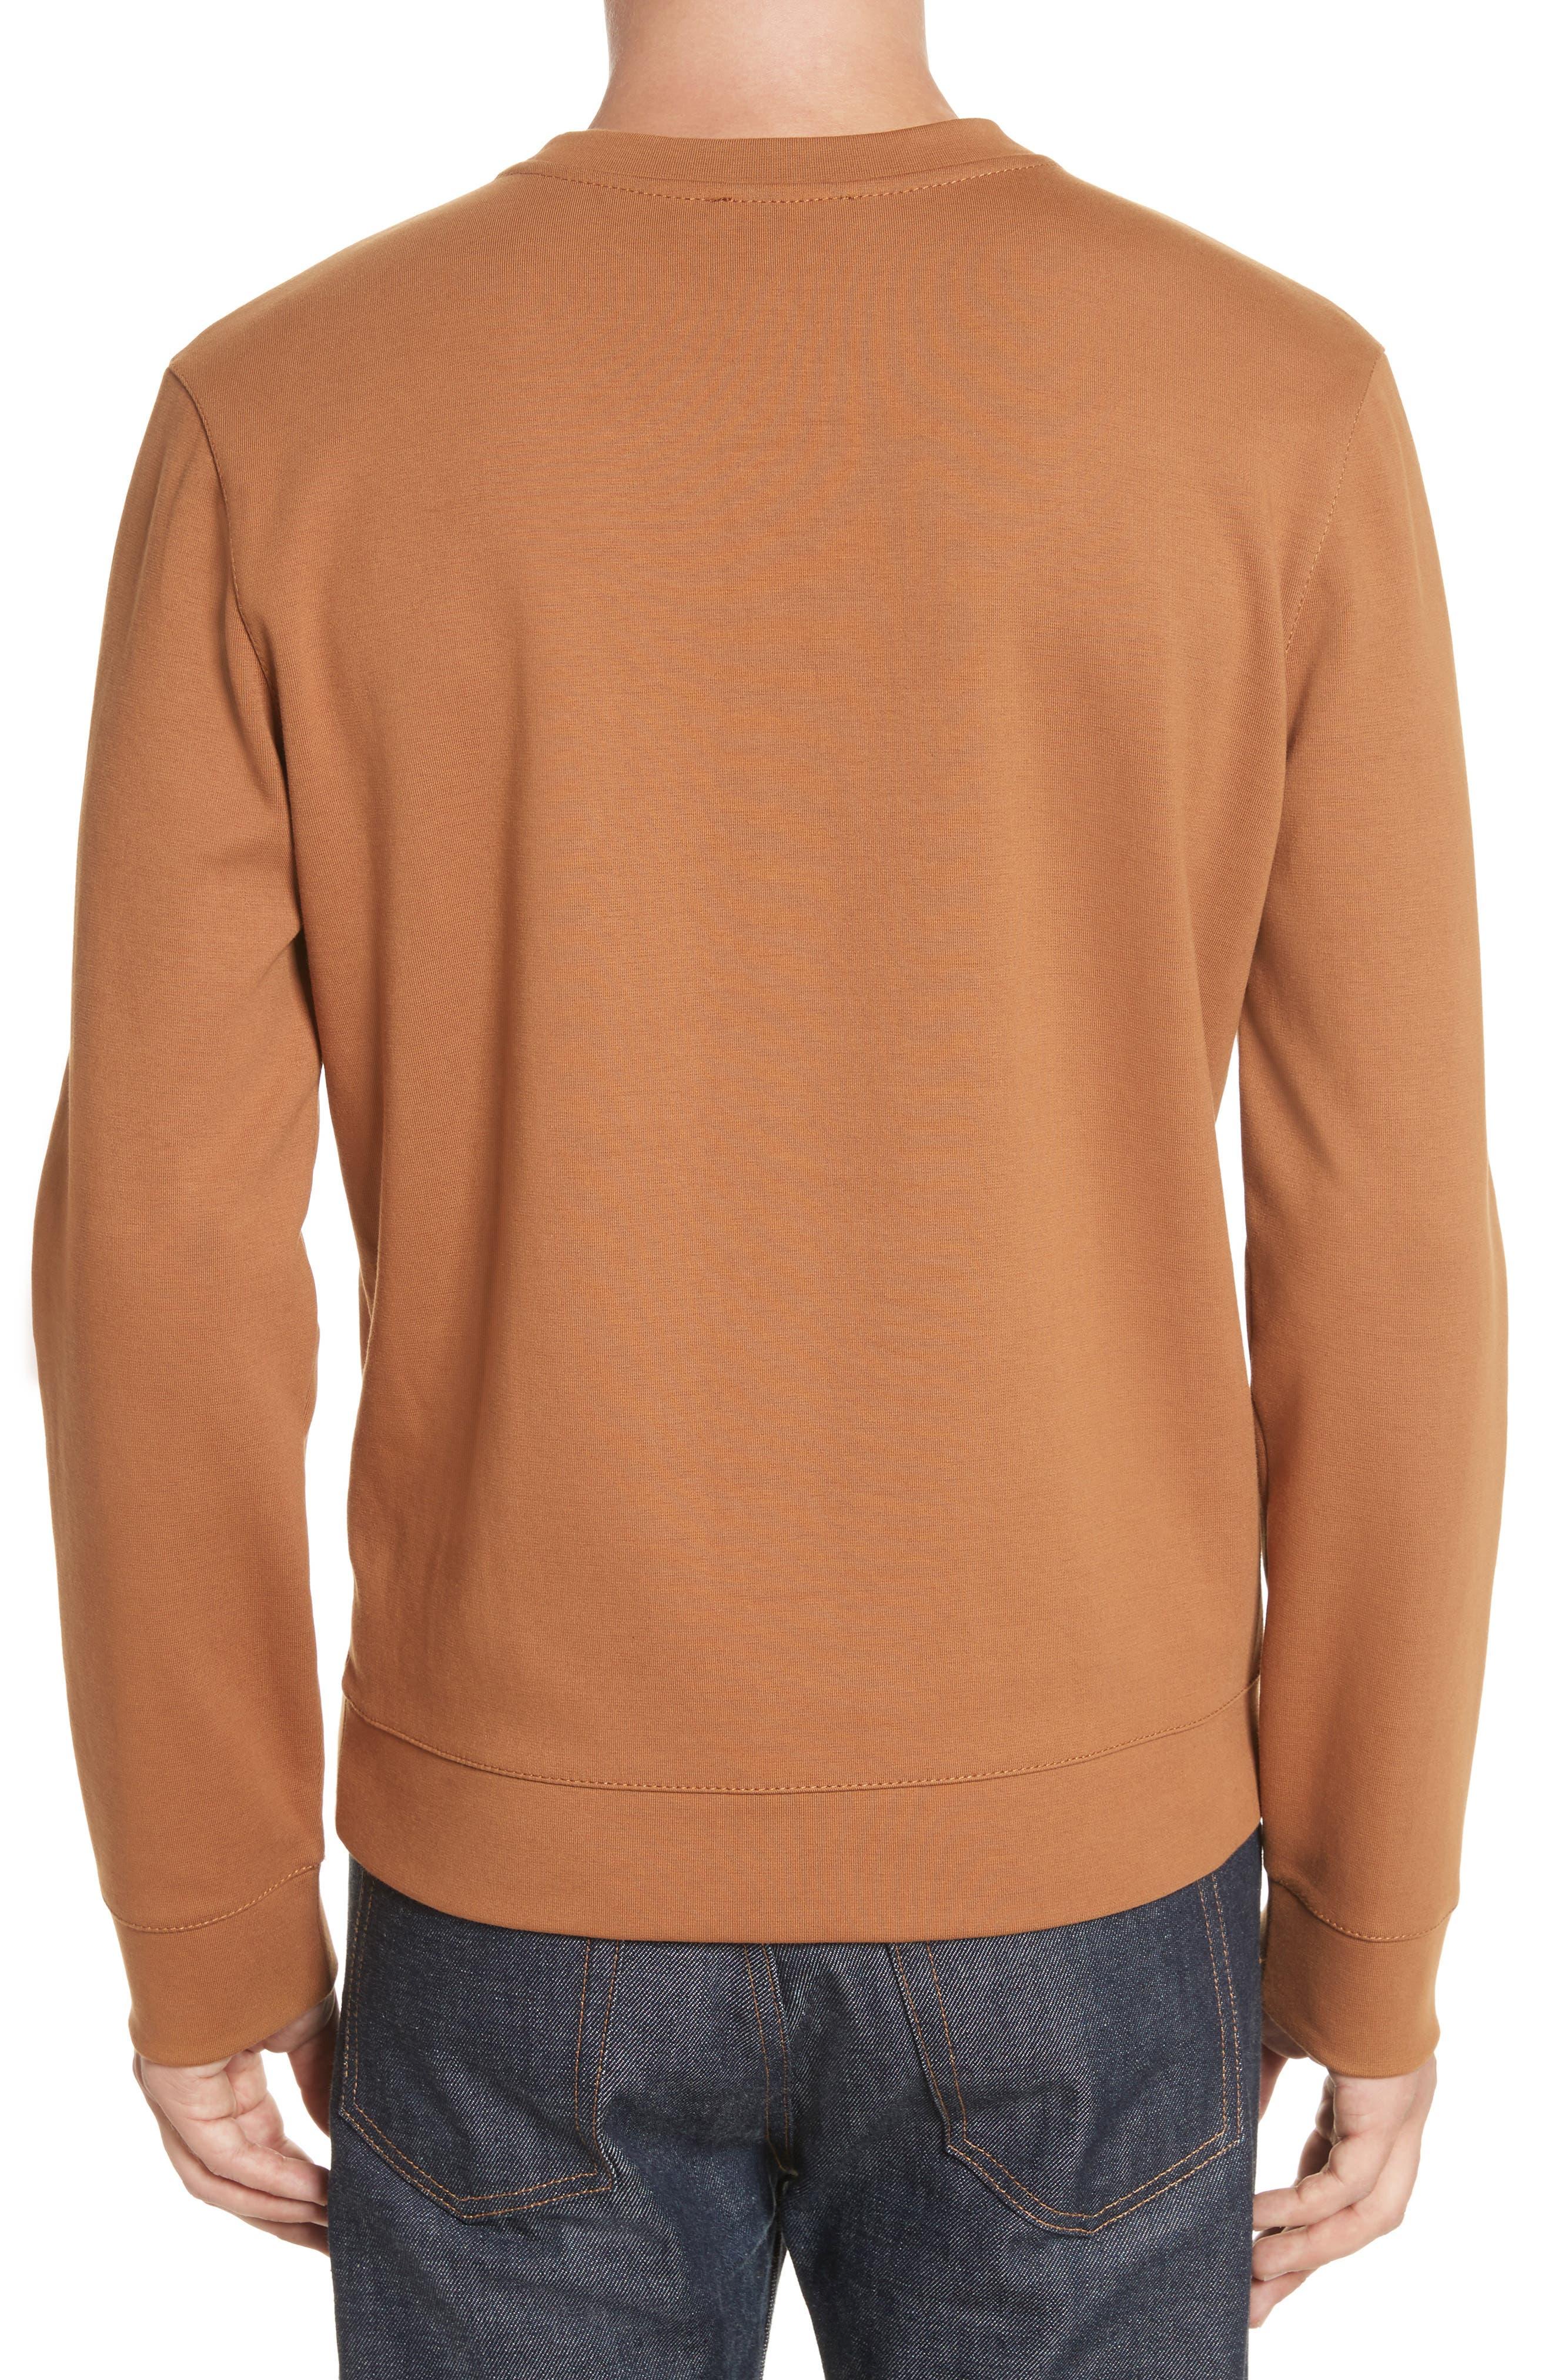 Yogi Sweatshirt,                             Alternate thumbnail 2, color,                             243